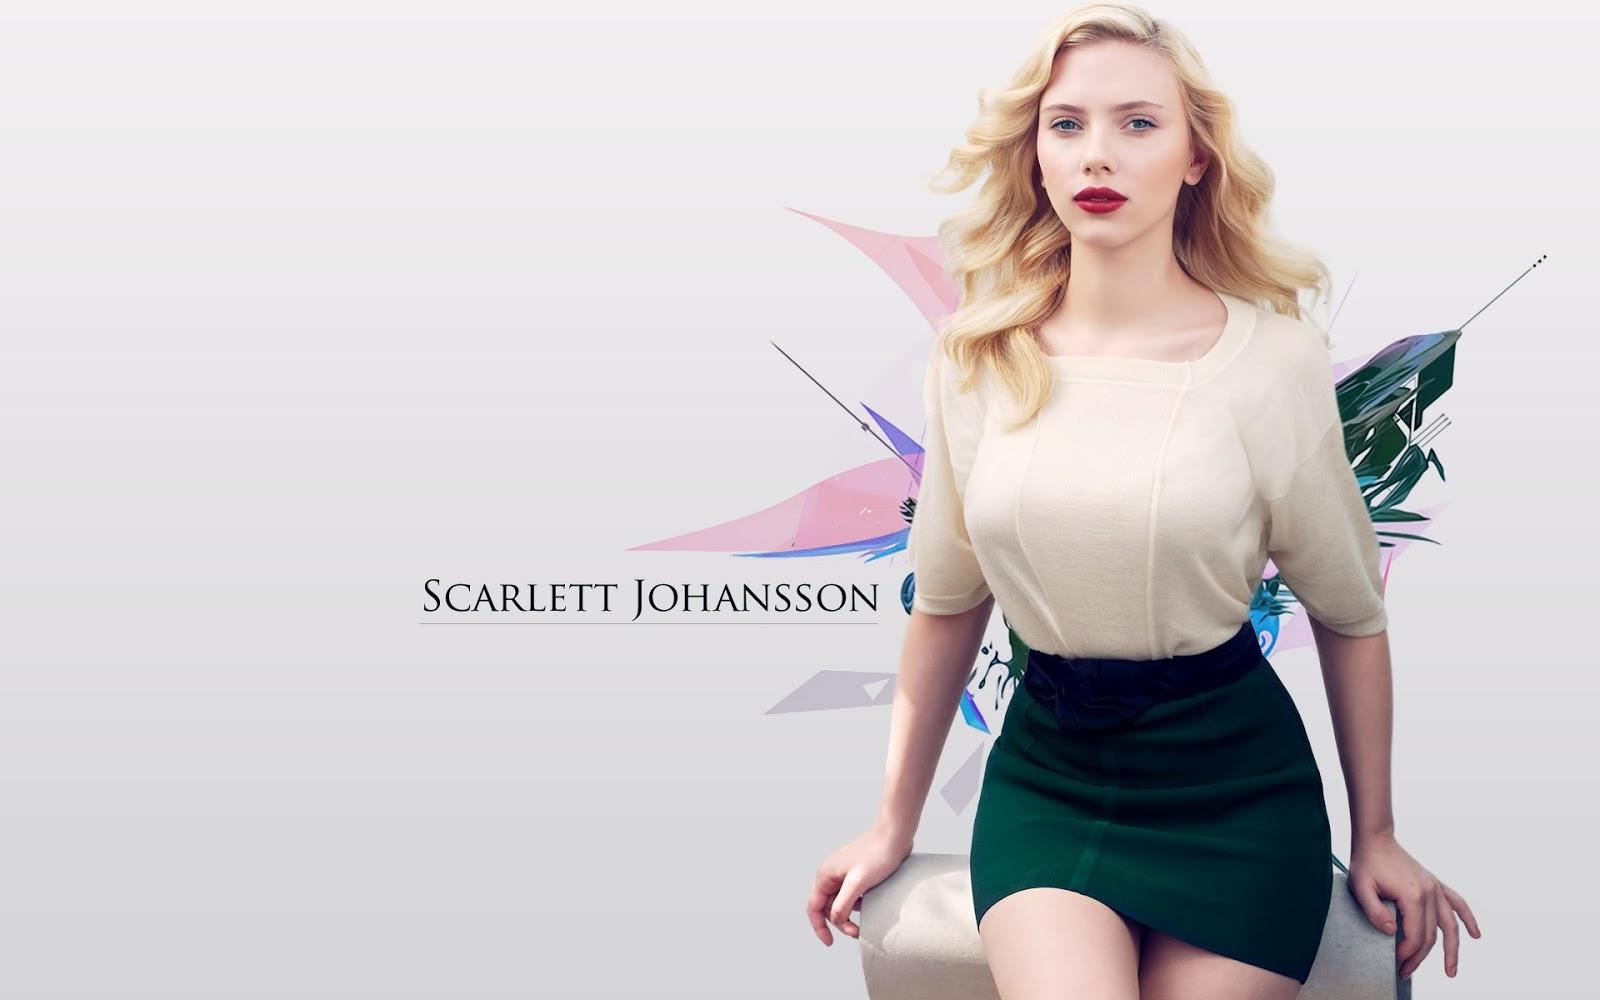 High Quality Hds Pics Of Scarlett Johansson As Redhead: Scarlett Johansson Background